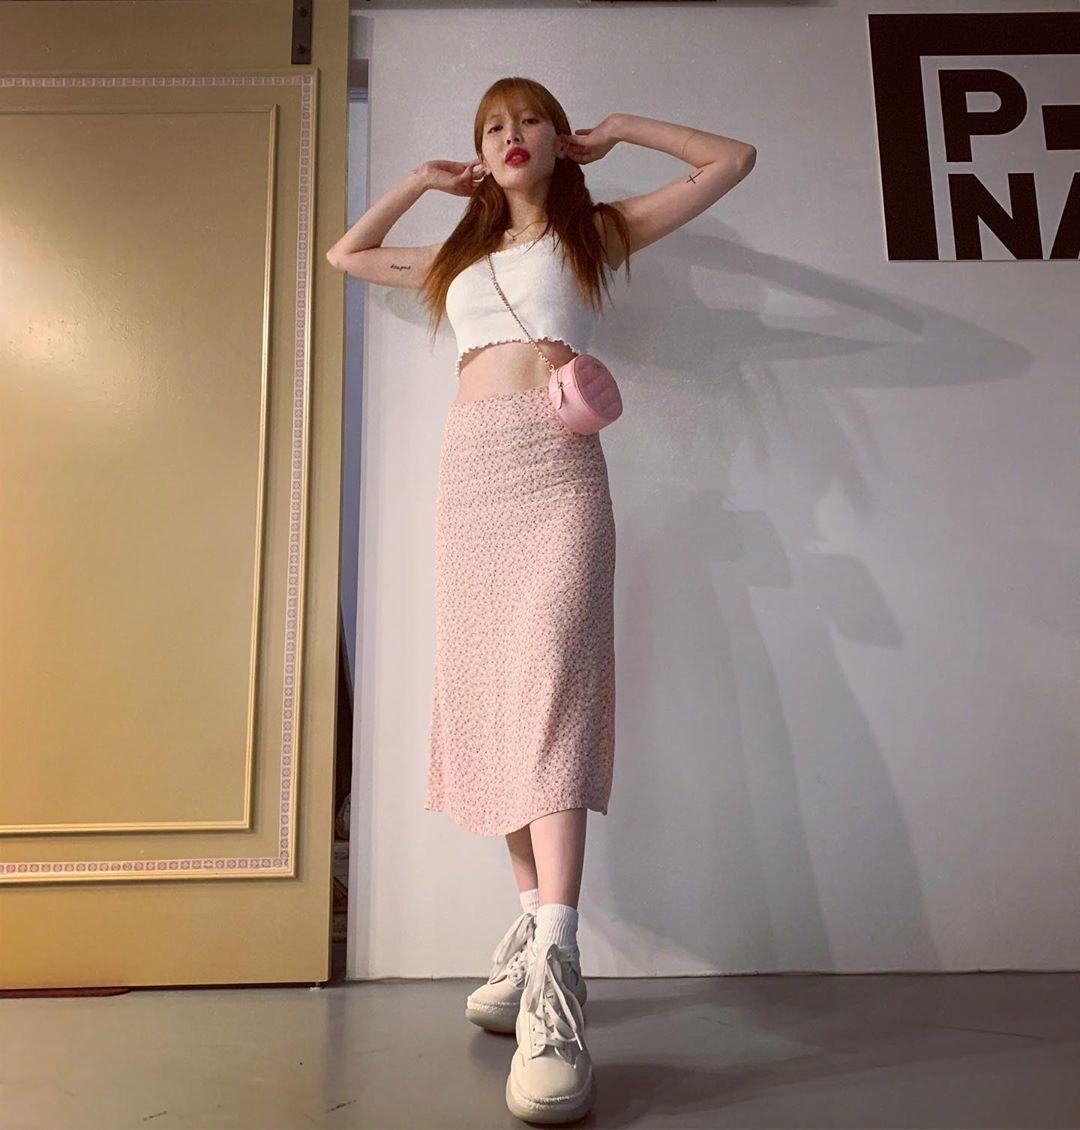 8 Gaya Busana HyunA, Penyanyi Korea yang Berhasil Memikat Perhatian